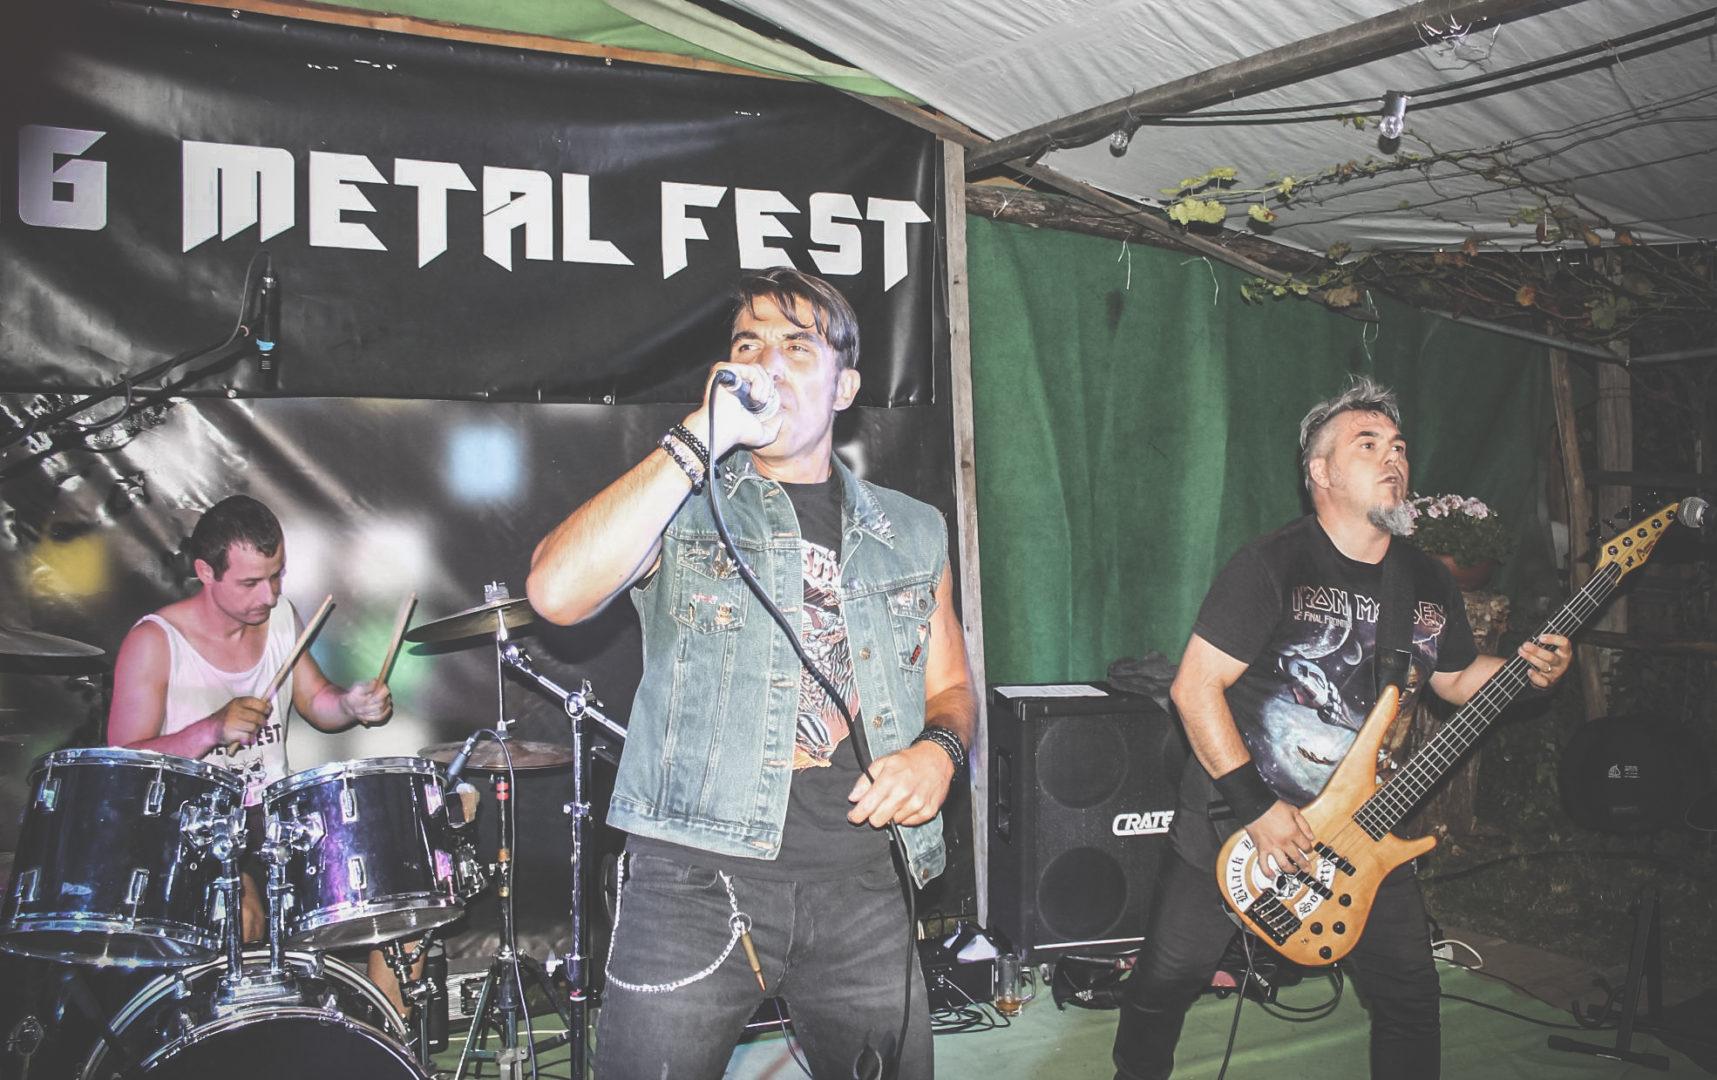 Anguish Force Atzwang Metal Fest 2019 12 - Atzwang Metal Fest 9 - live